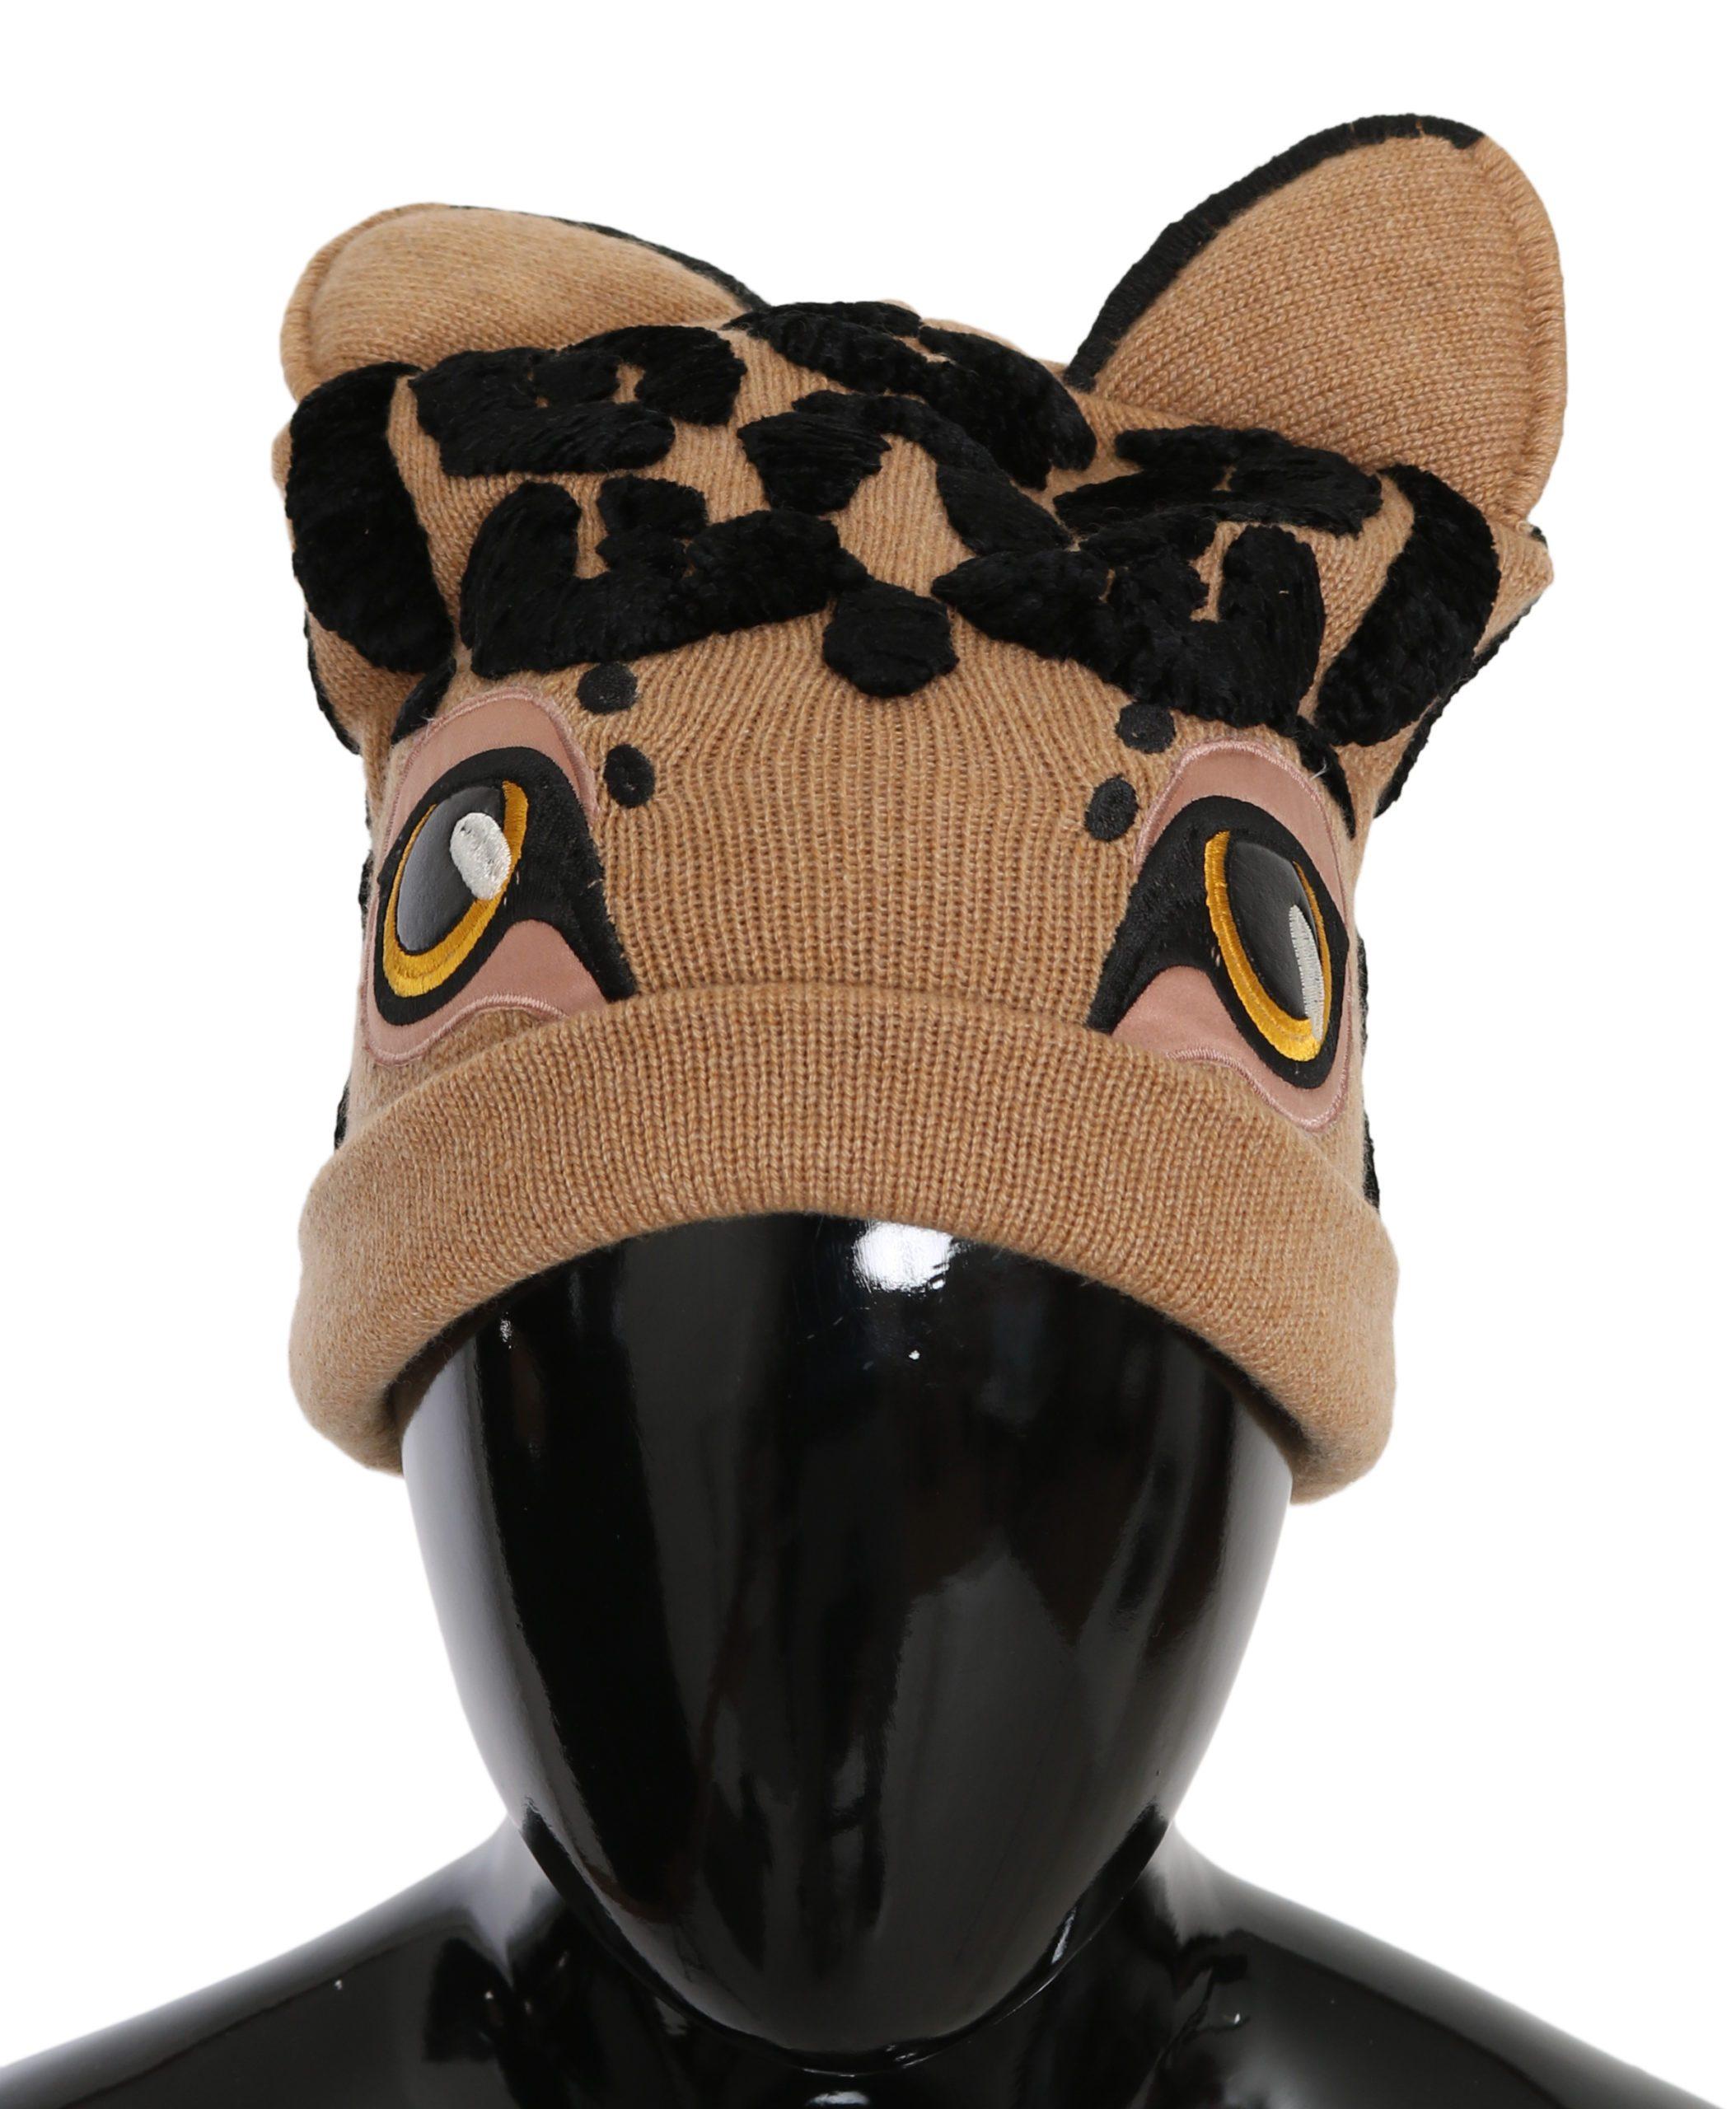 Dolce & Gabbana Women's Cashmere Knitted Hat Brown HAT9052